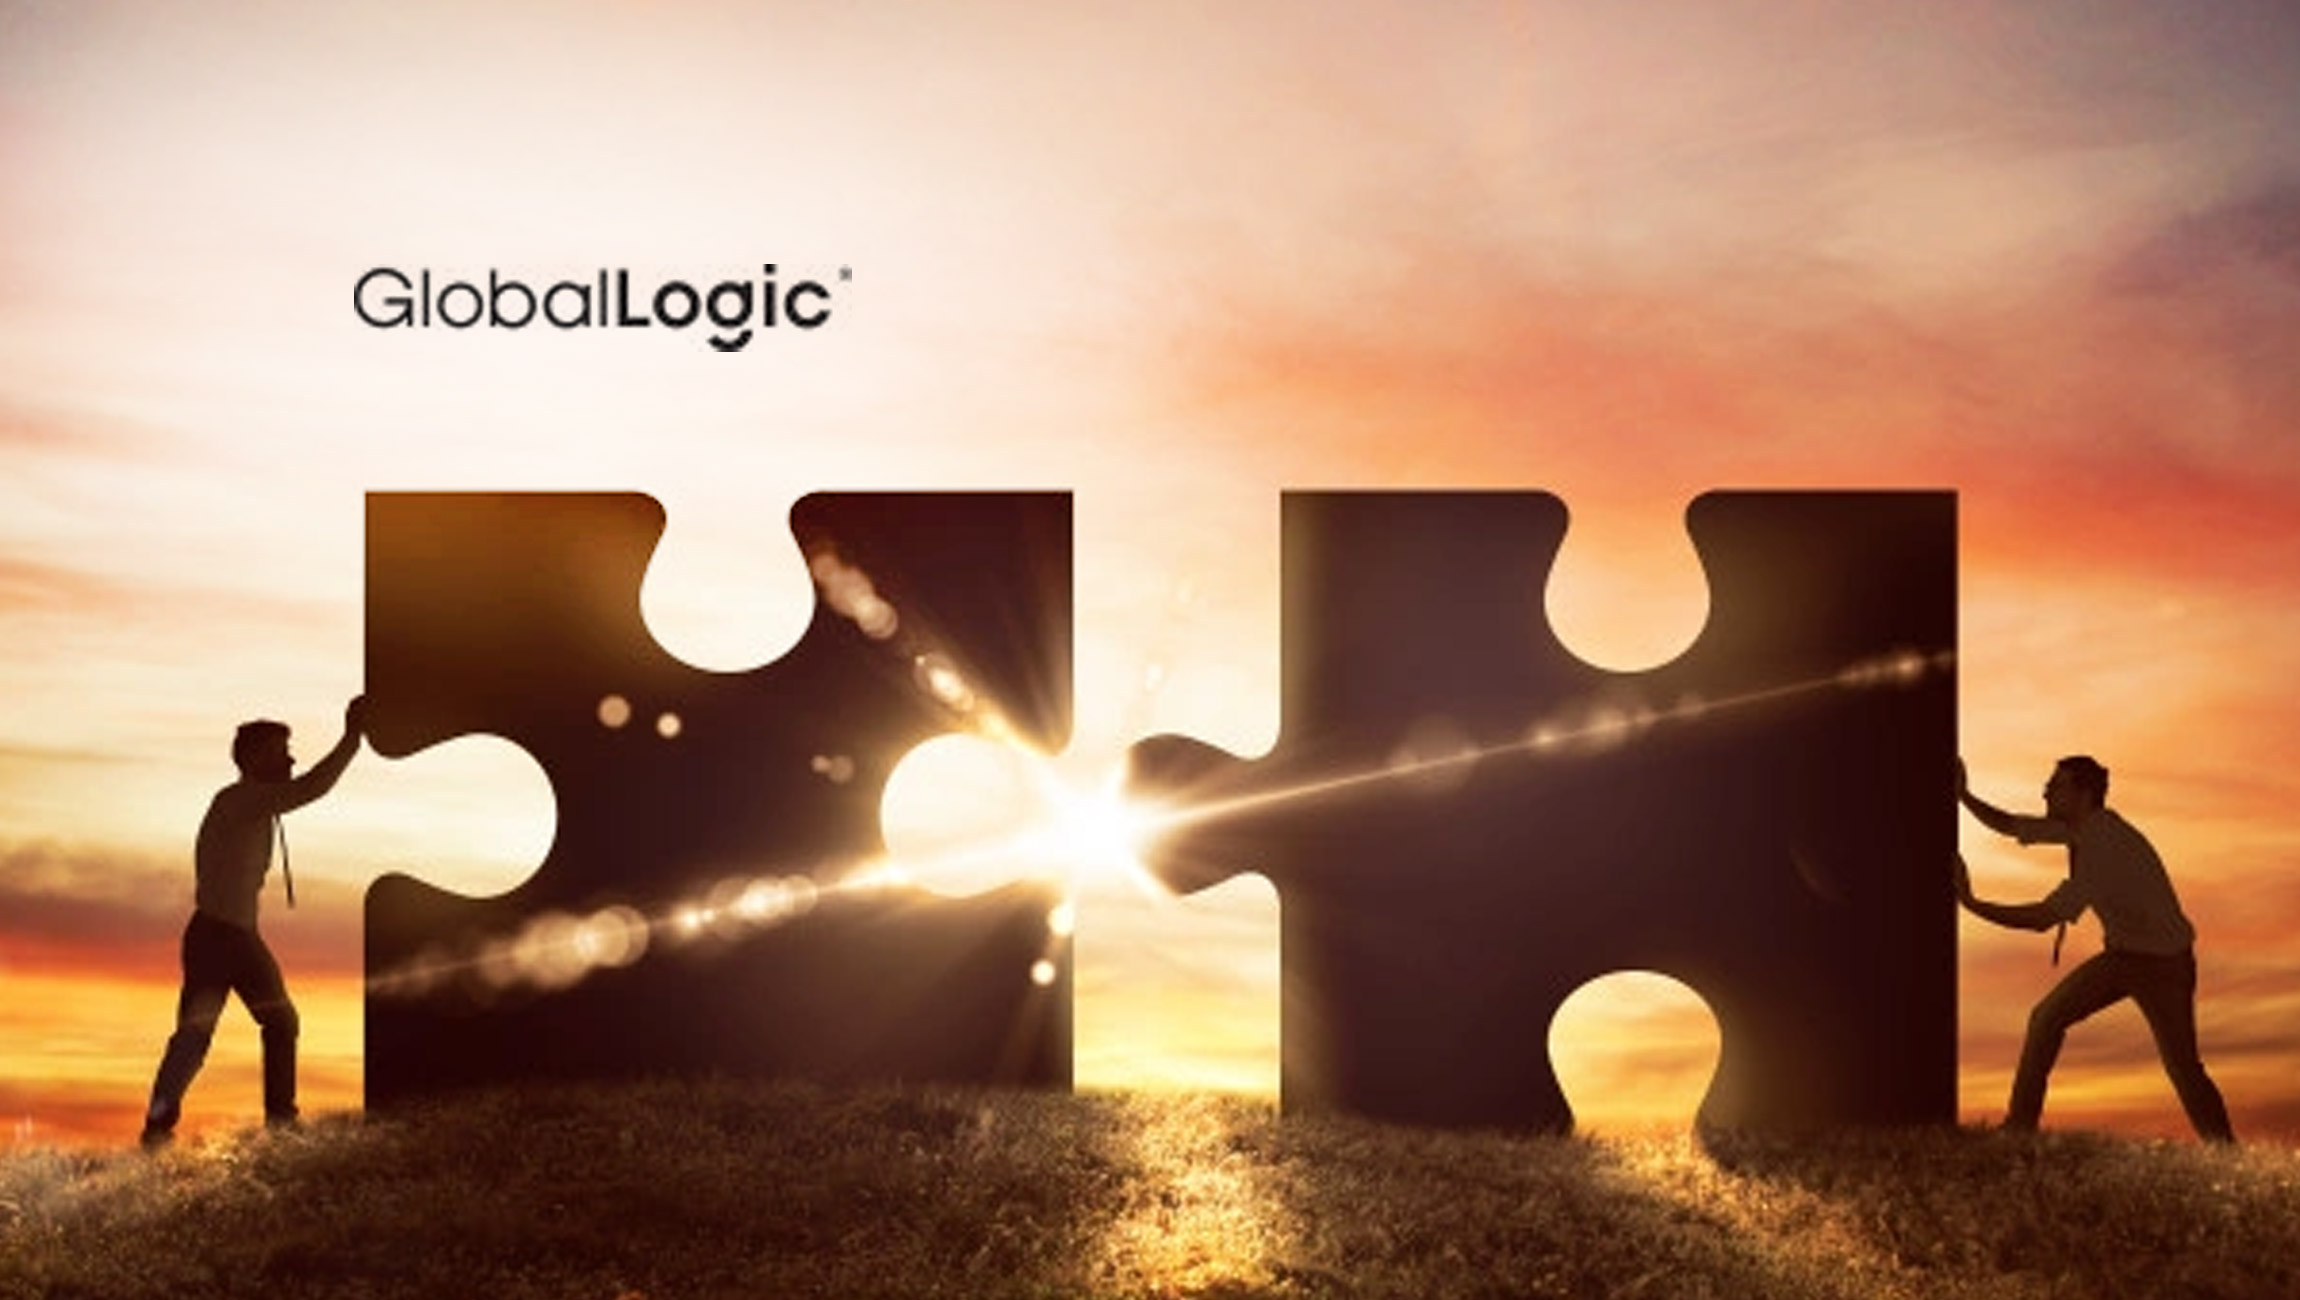 GlobalLogic Acquires ECS Group, a Leading UK-Based Digital Transformation Company